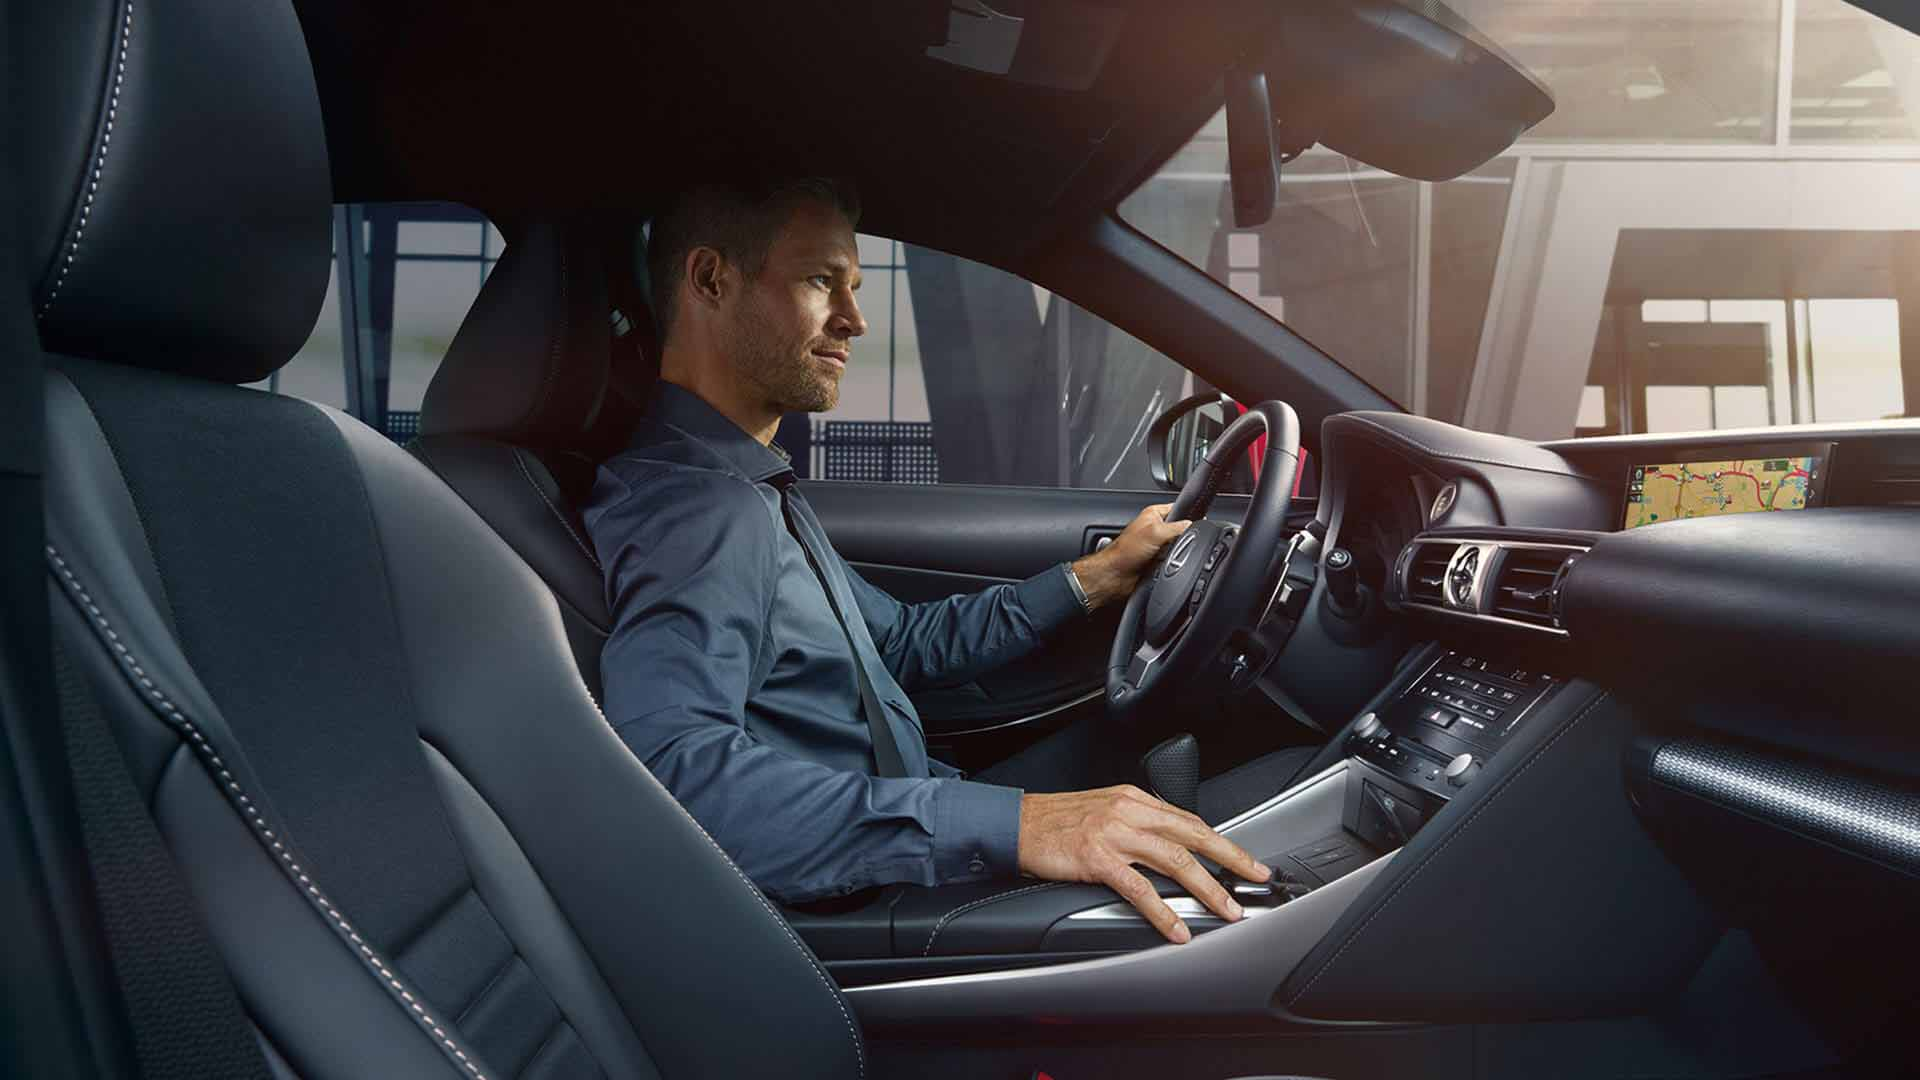 Lexus Pay Per Drive 1920x1080 image